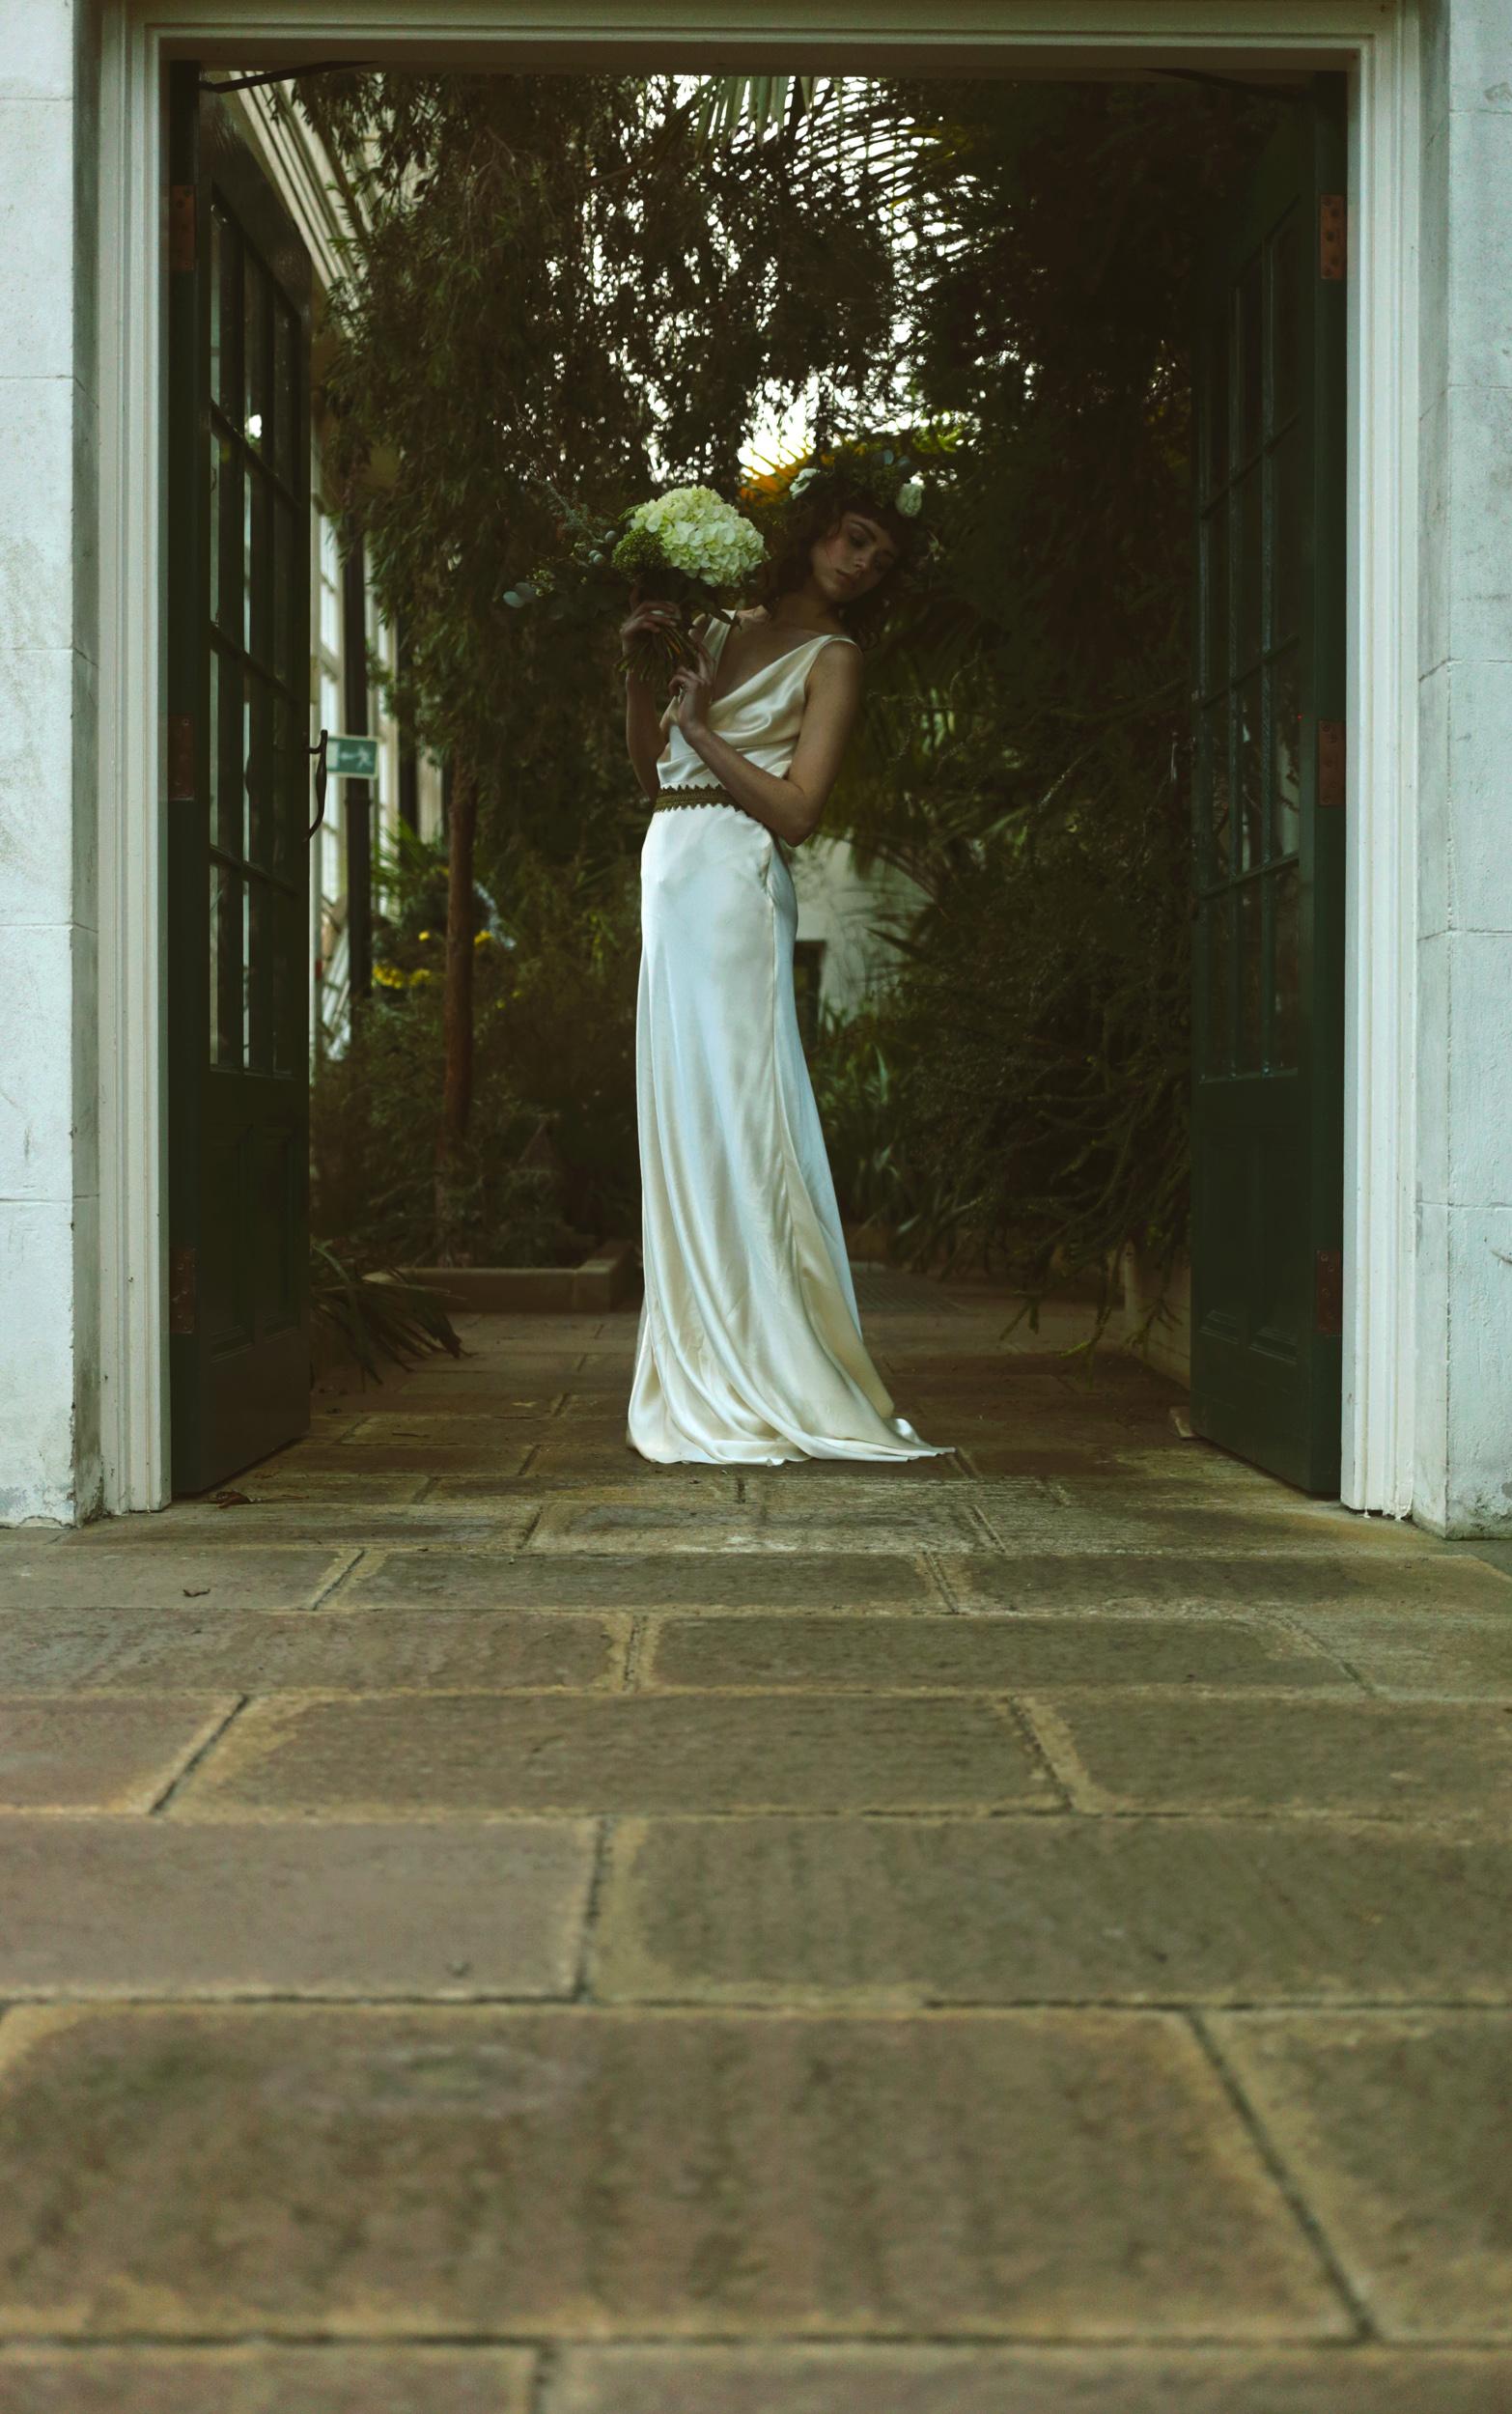 Winter-Bridal-Kate-Beaumont-Shelley-Richmond-Vintage-Wedding-Dress-8.jpg